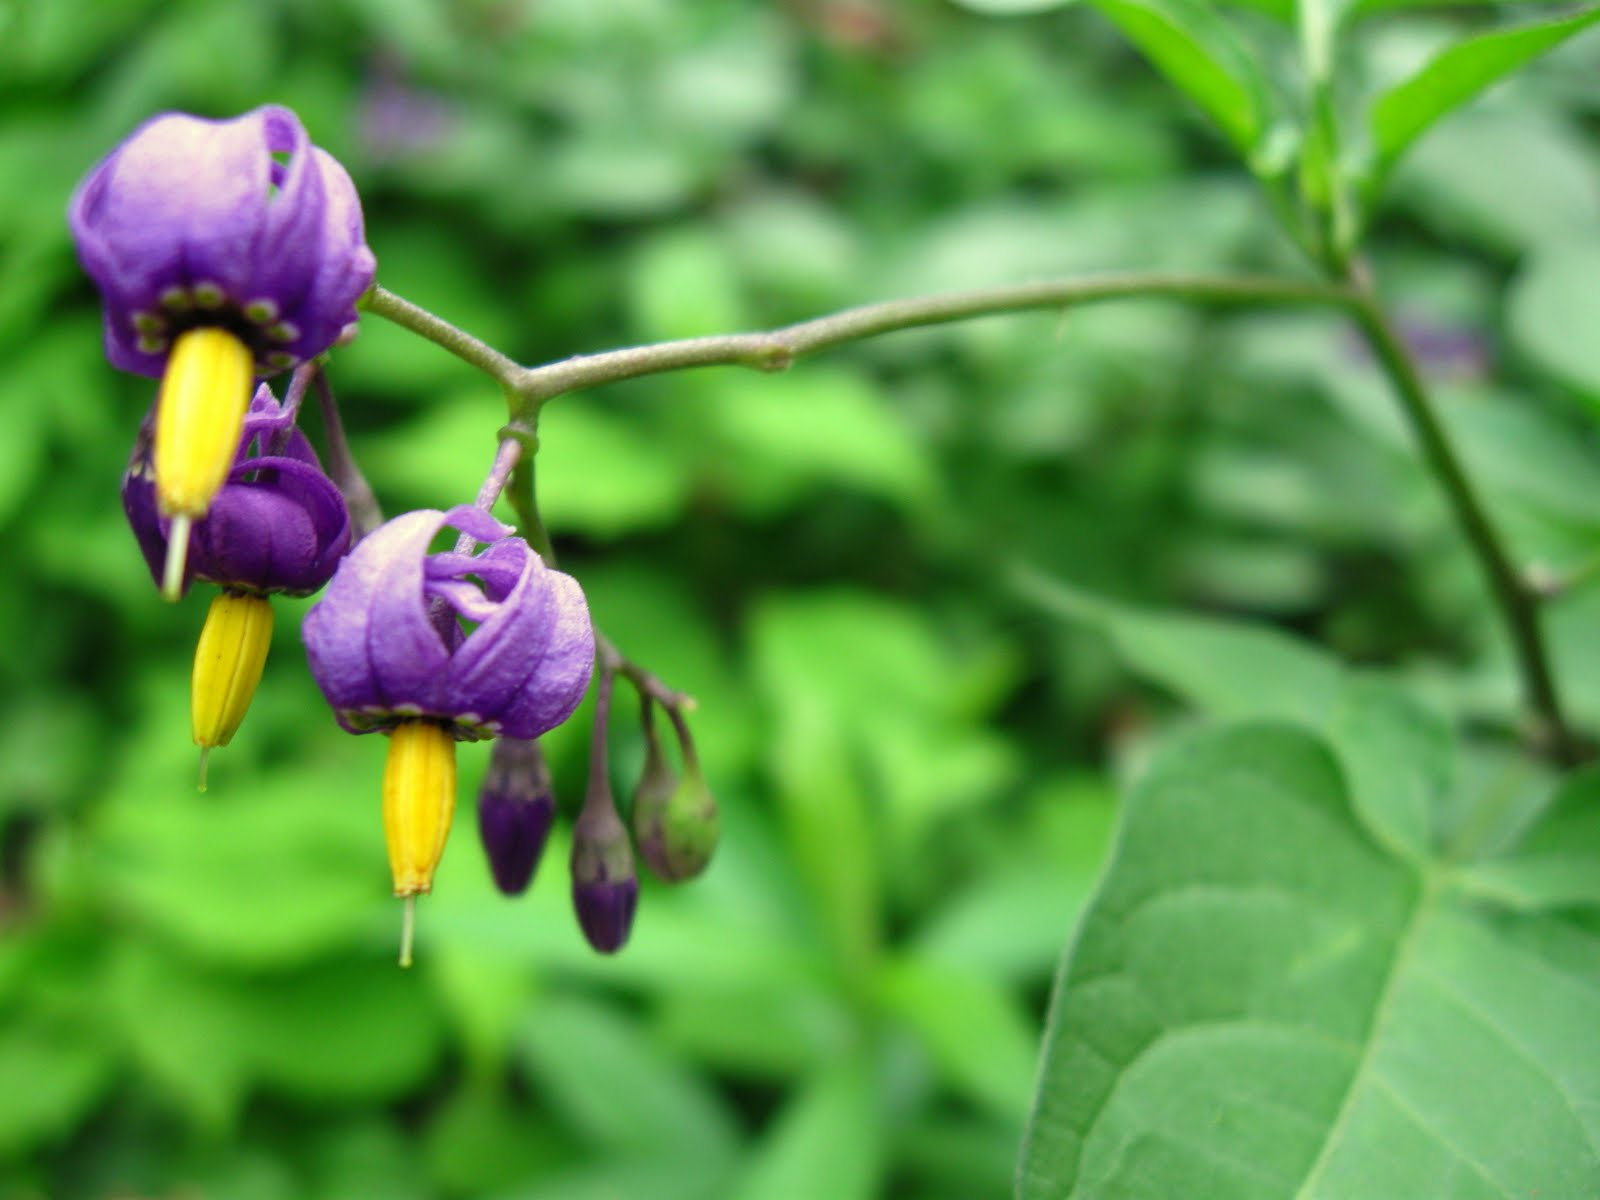 New York City Wildflowers: Bittersweet nightshade